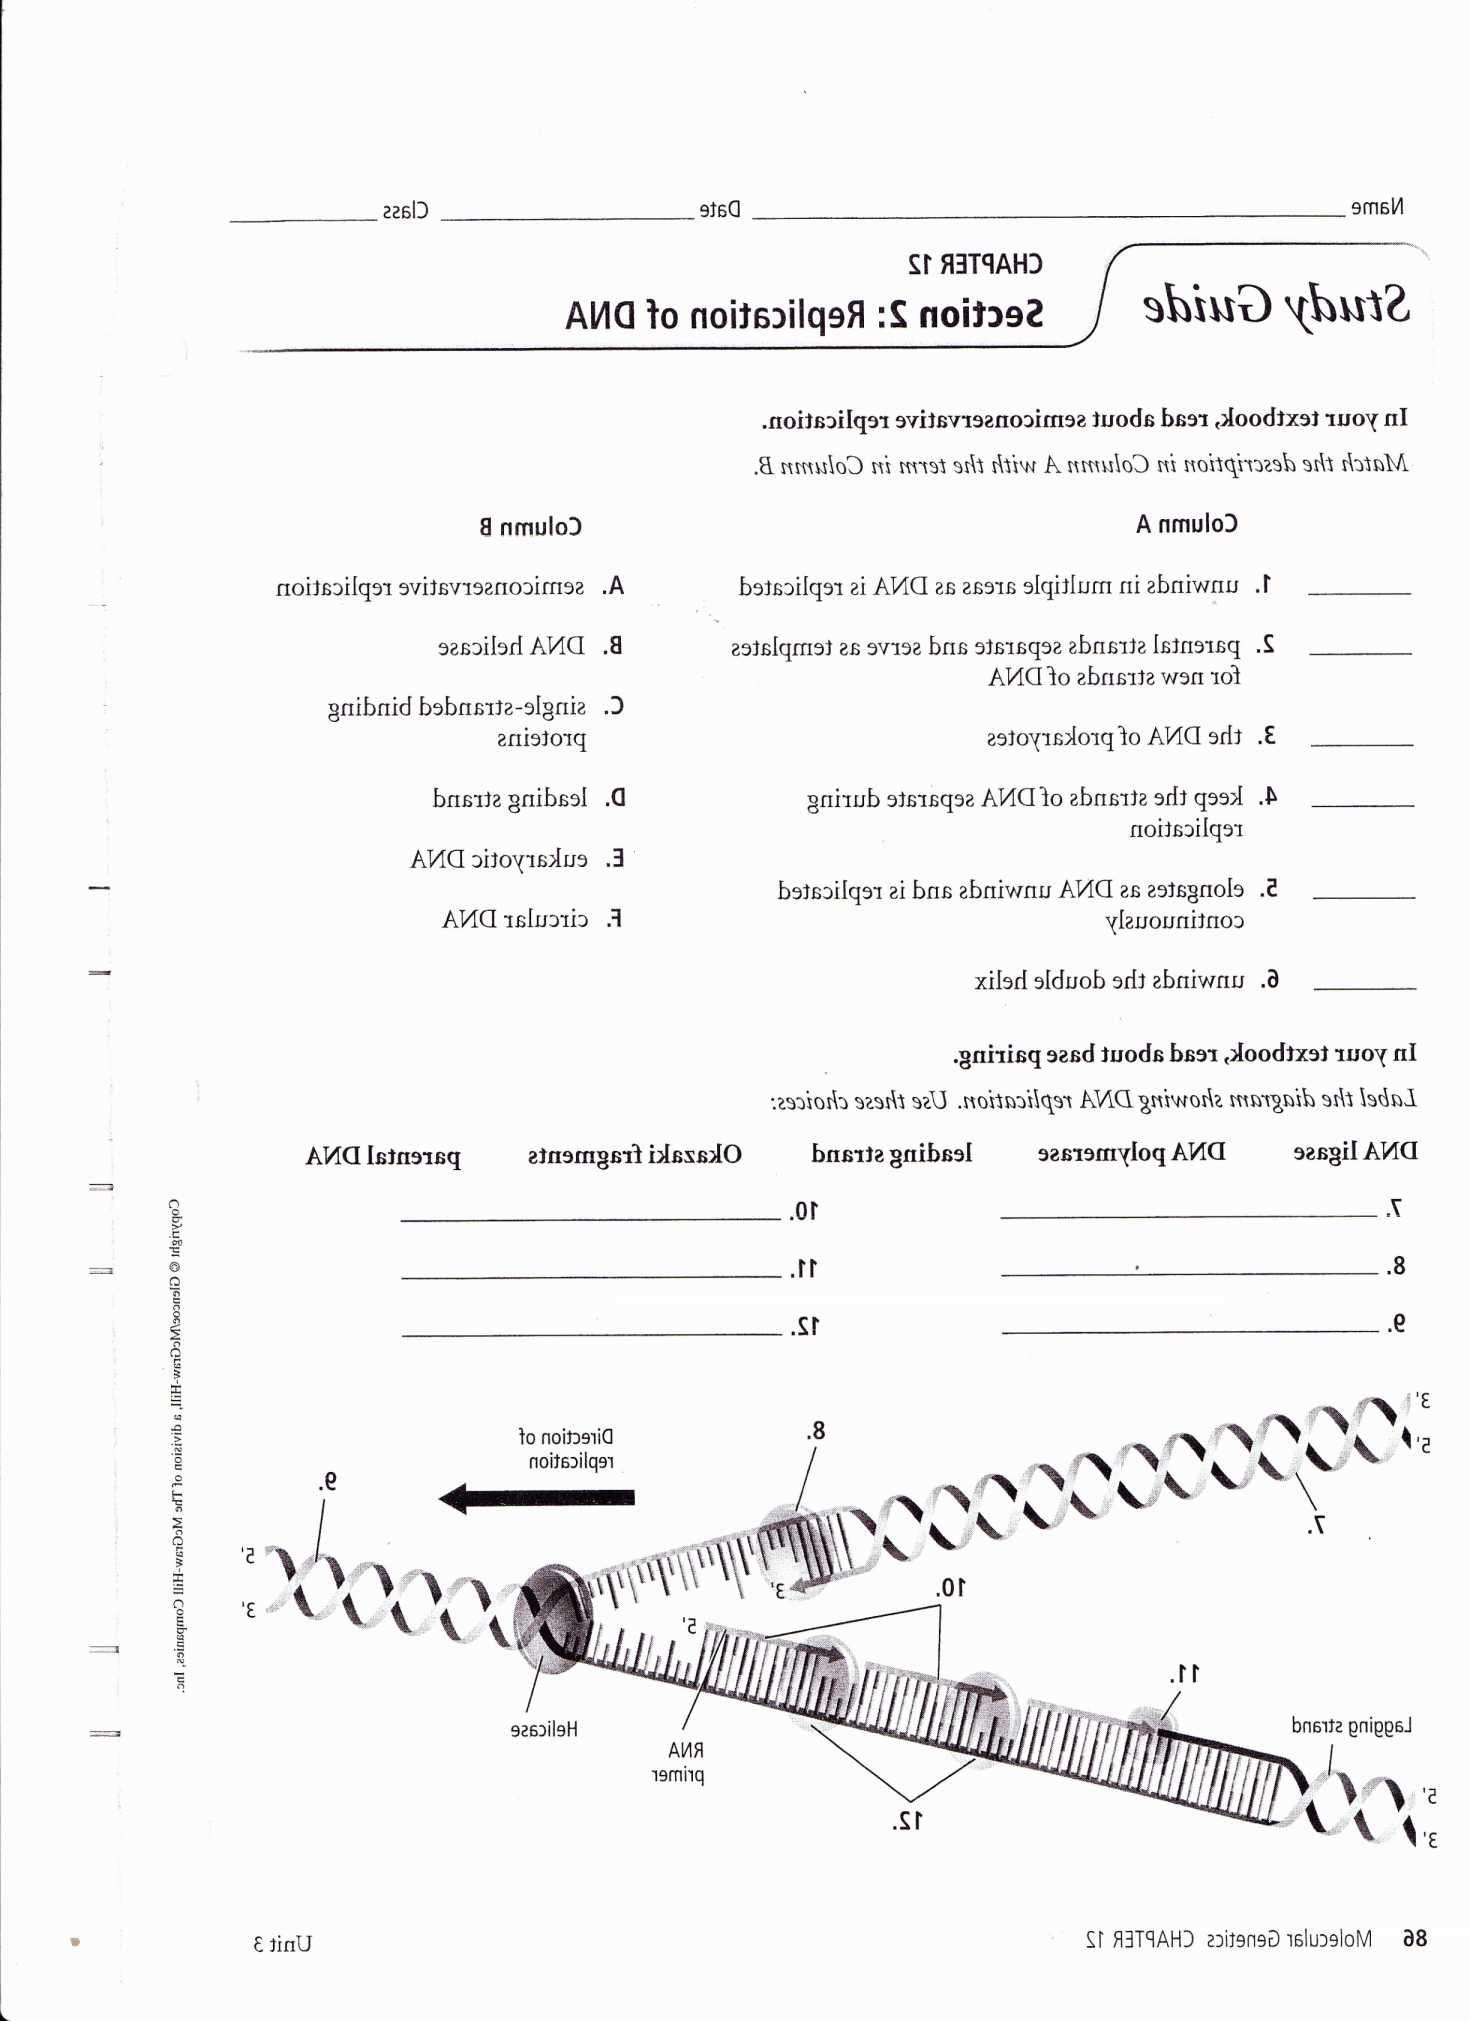 Human Inheritance Worksheet Answers